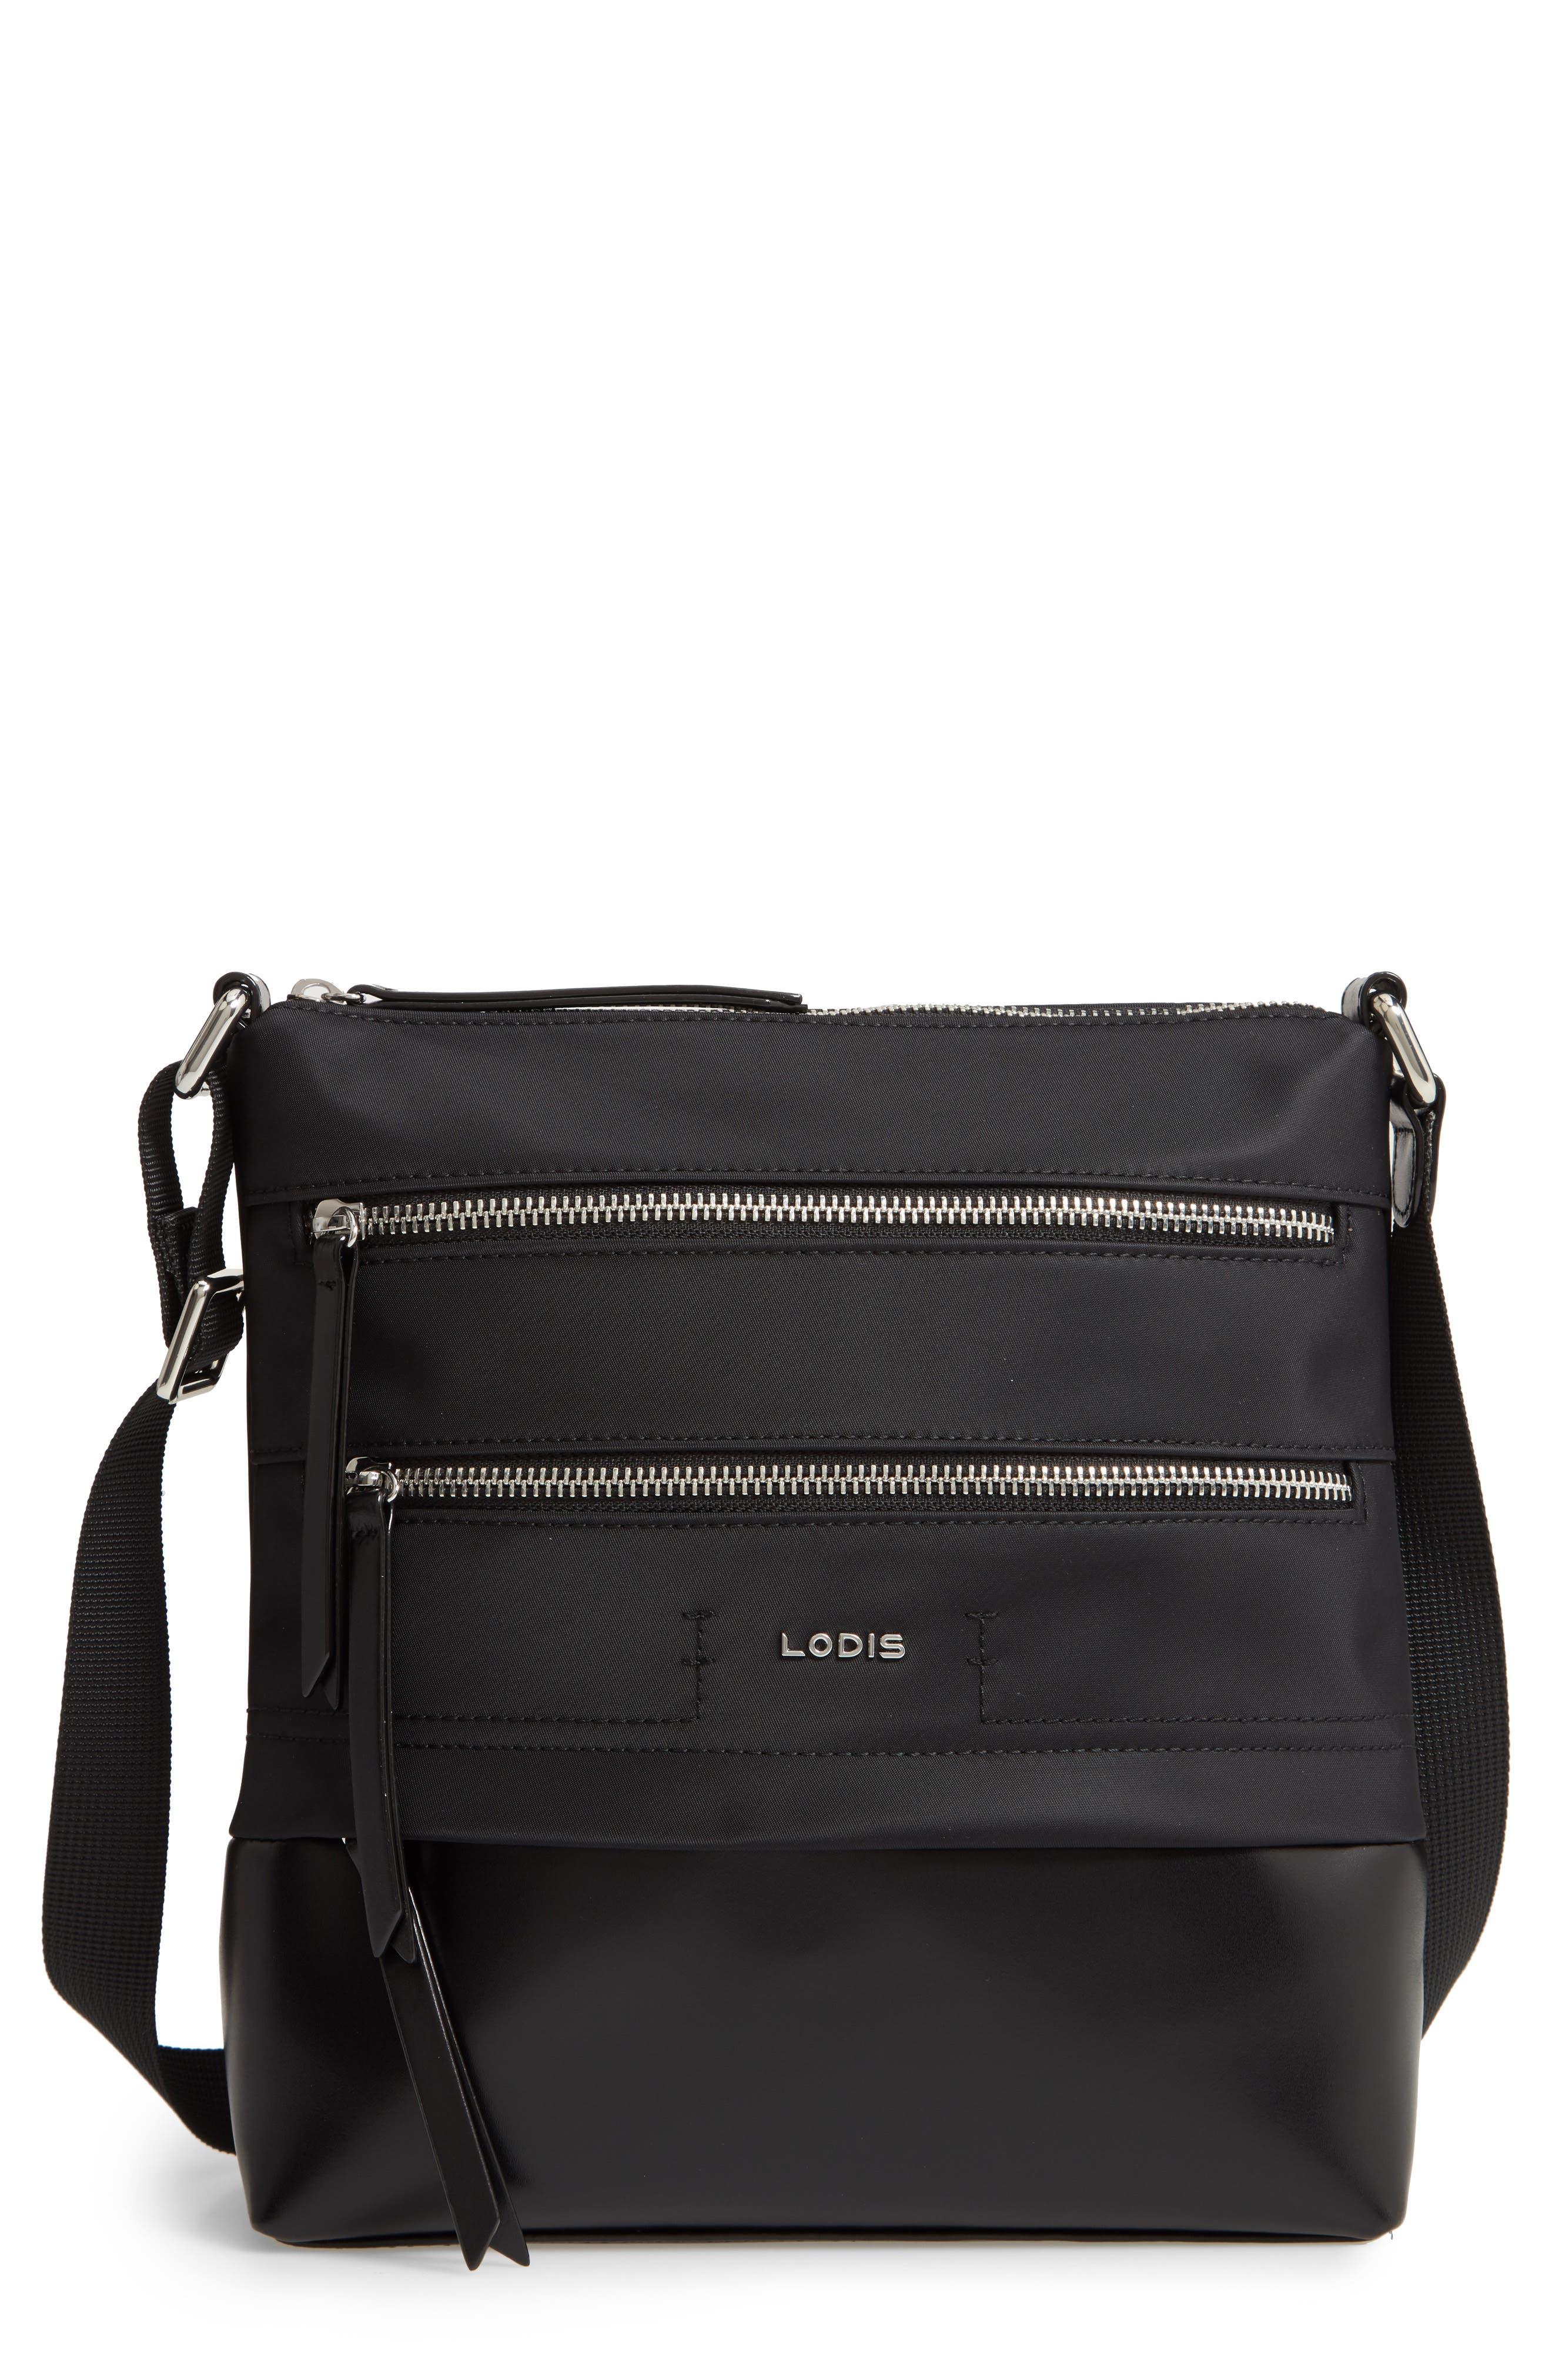 Wanda Nylon Sport RFID Travel Crossbody Bag,                         Main,                         color, BLACK